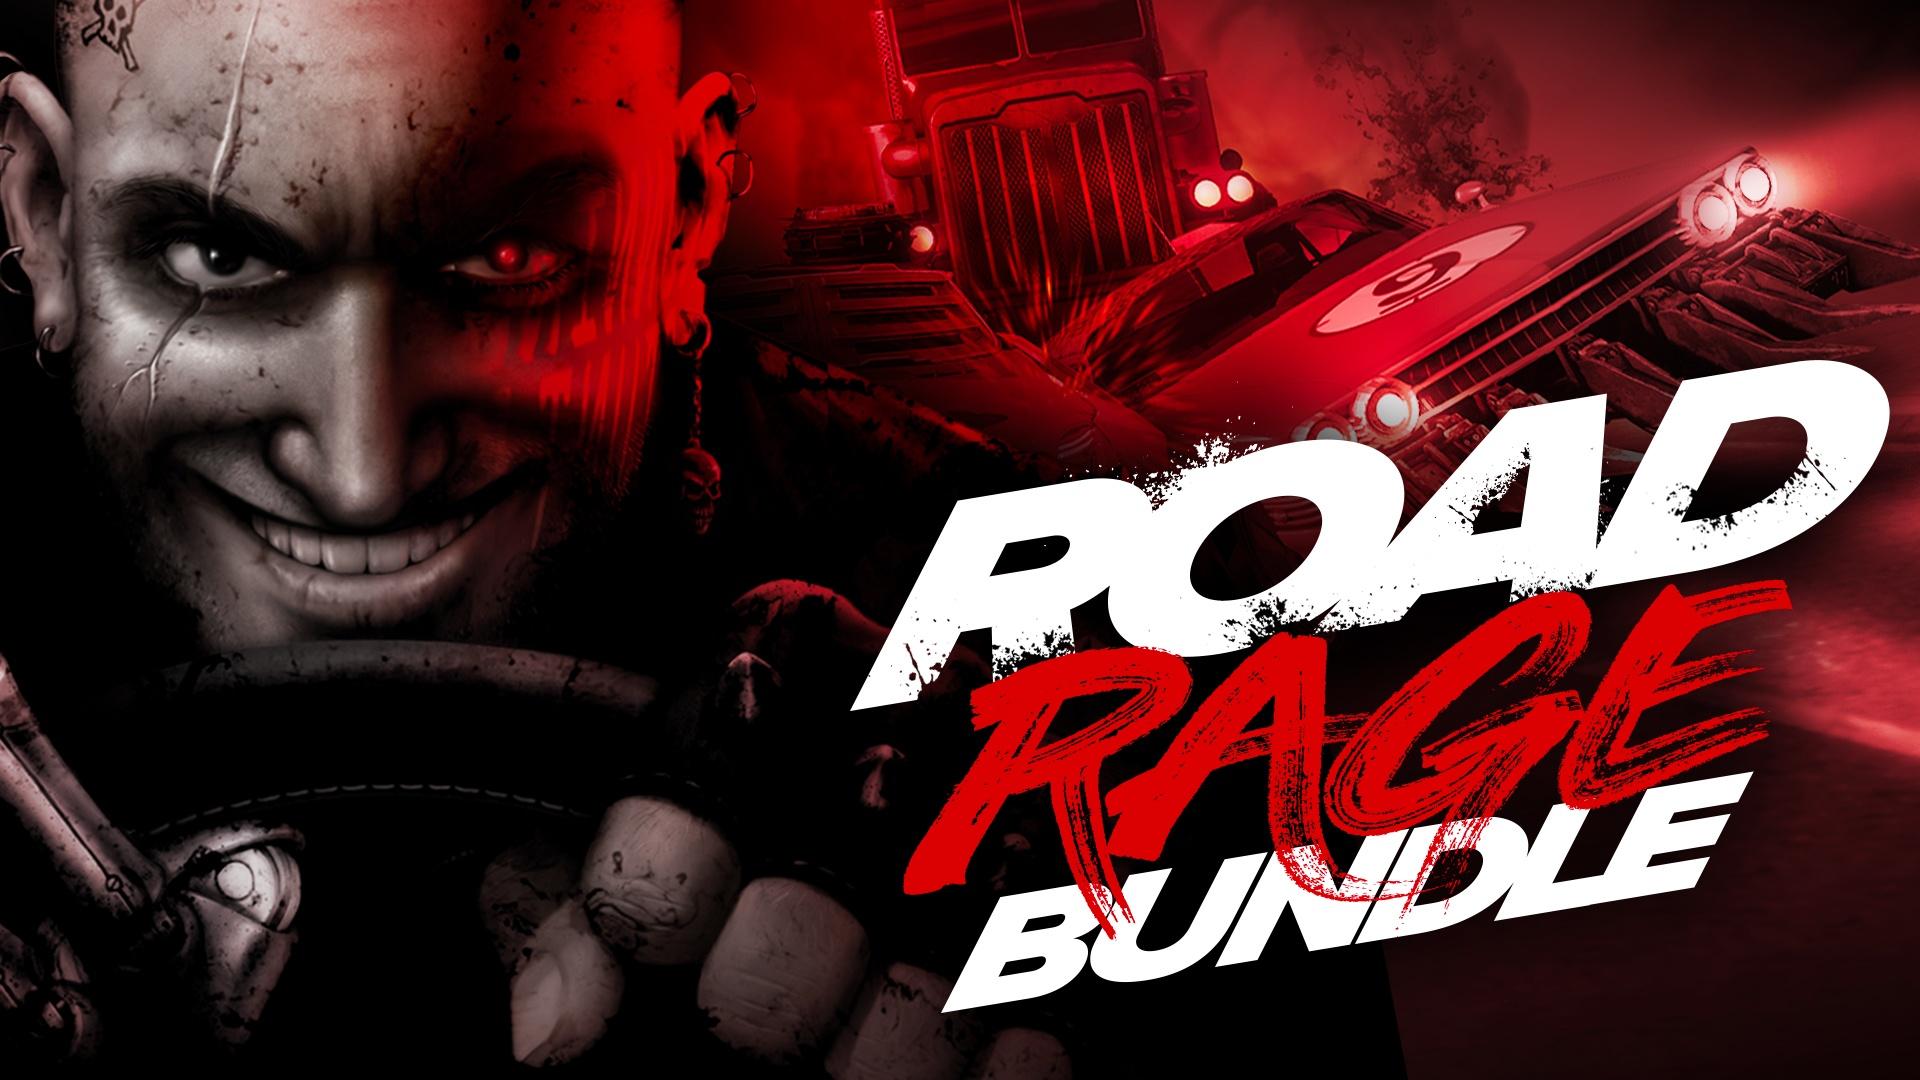 Road Rage Bundle | Steam Game Bundle | Fanatical